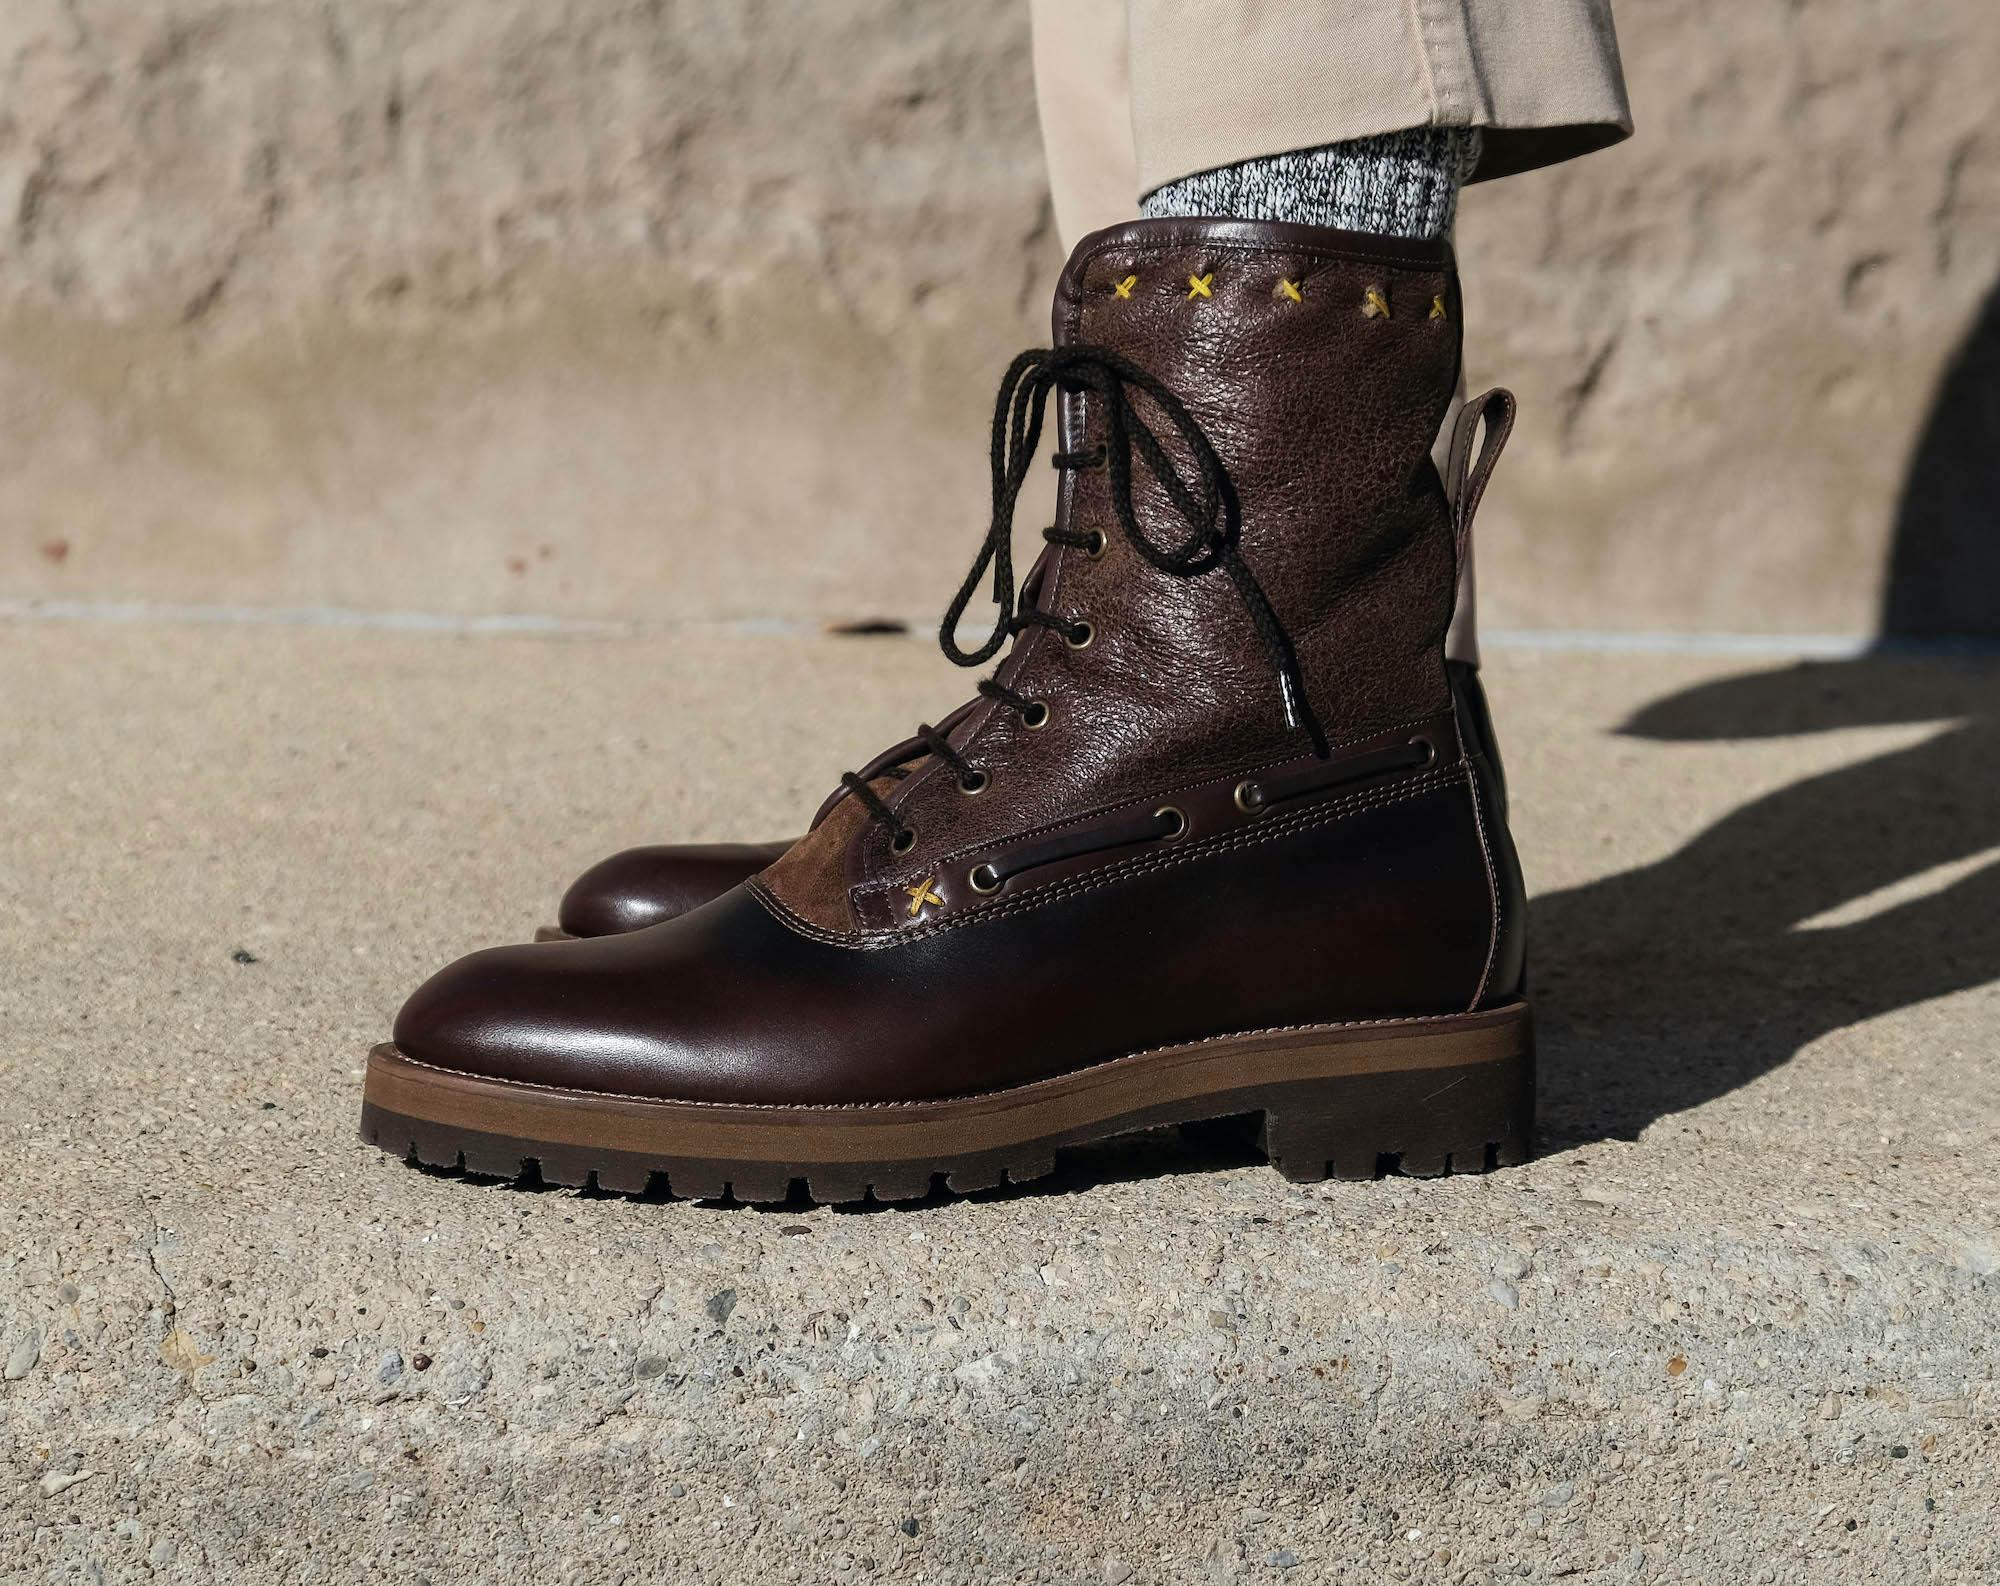 Caulaincourt Verbier tige chaussure homme